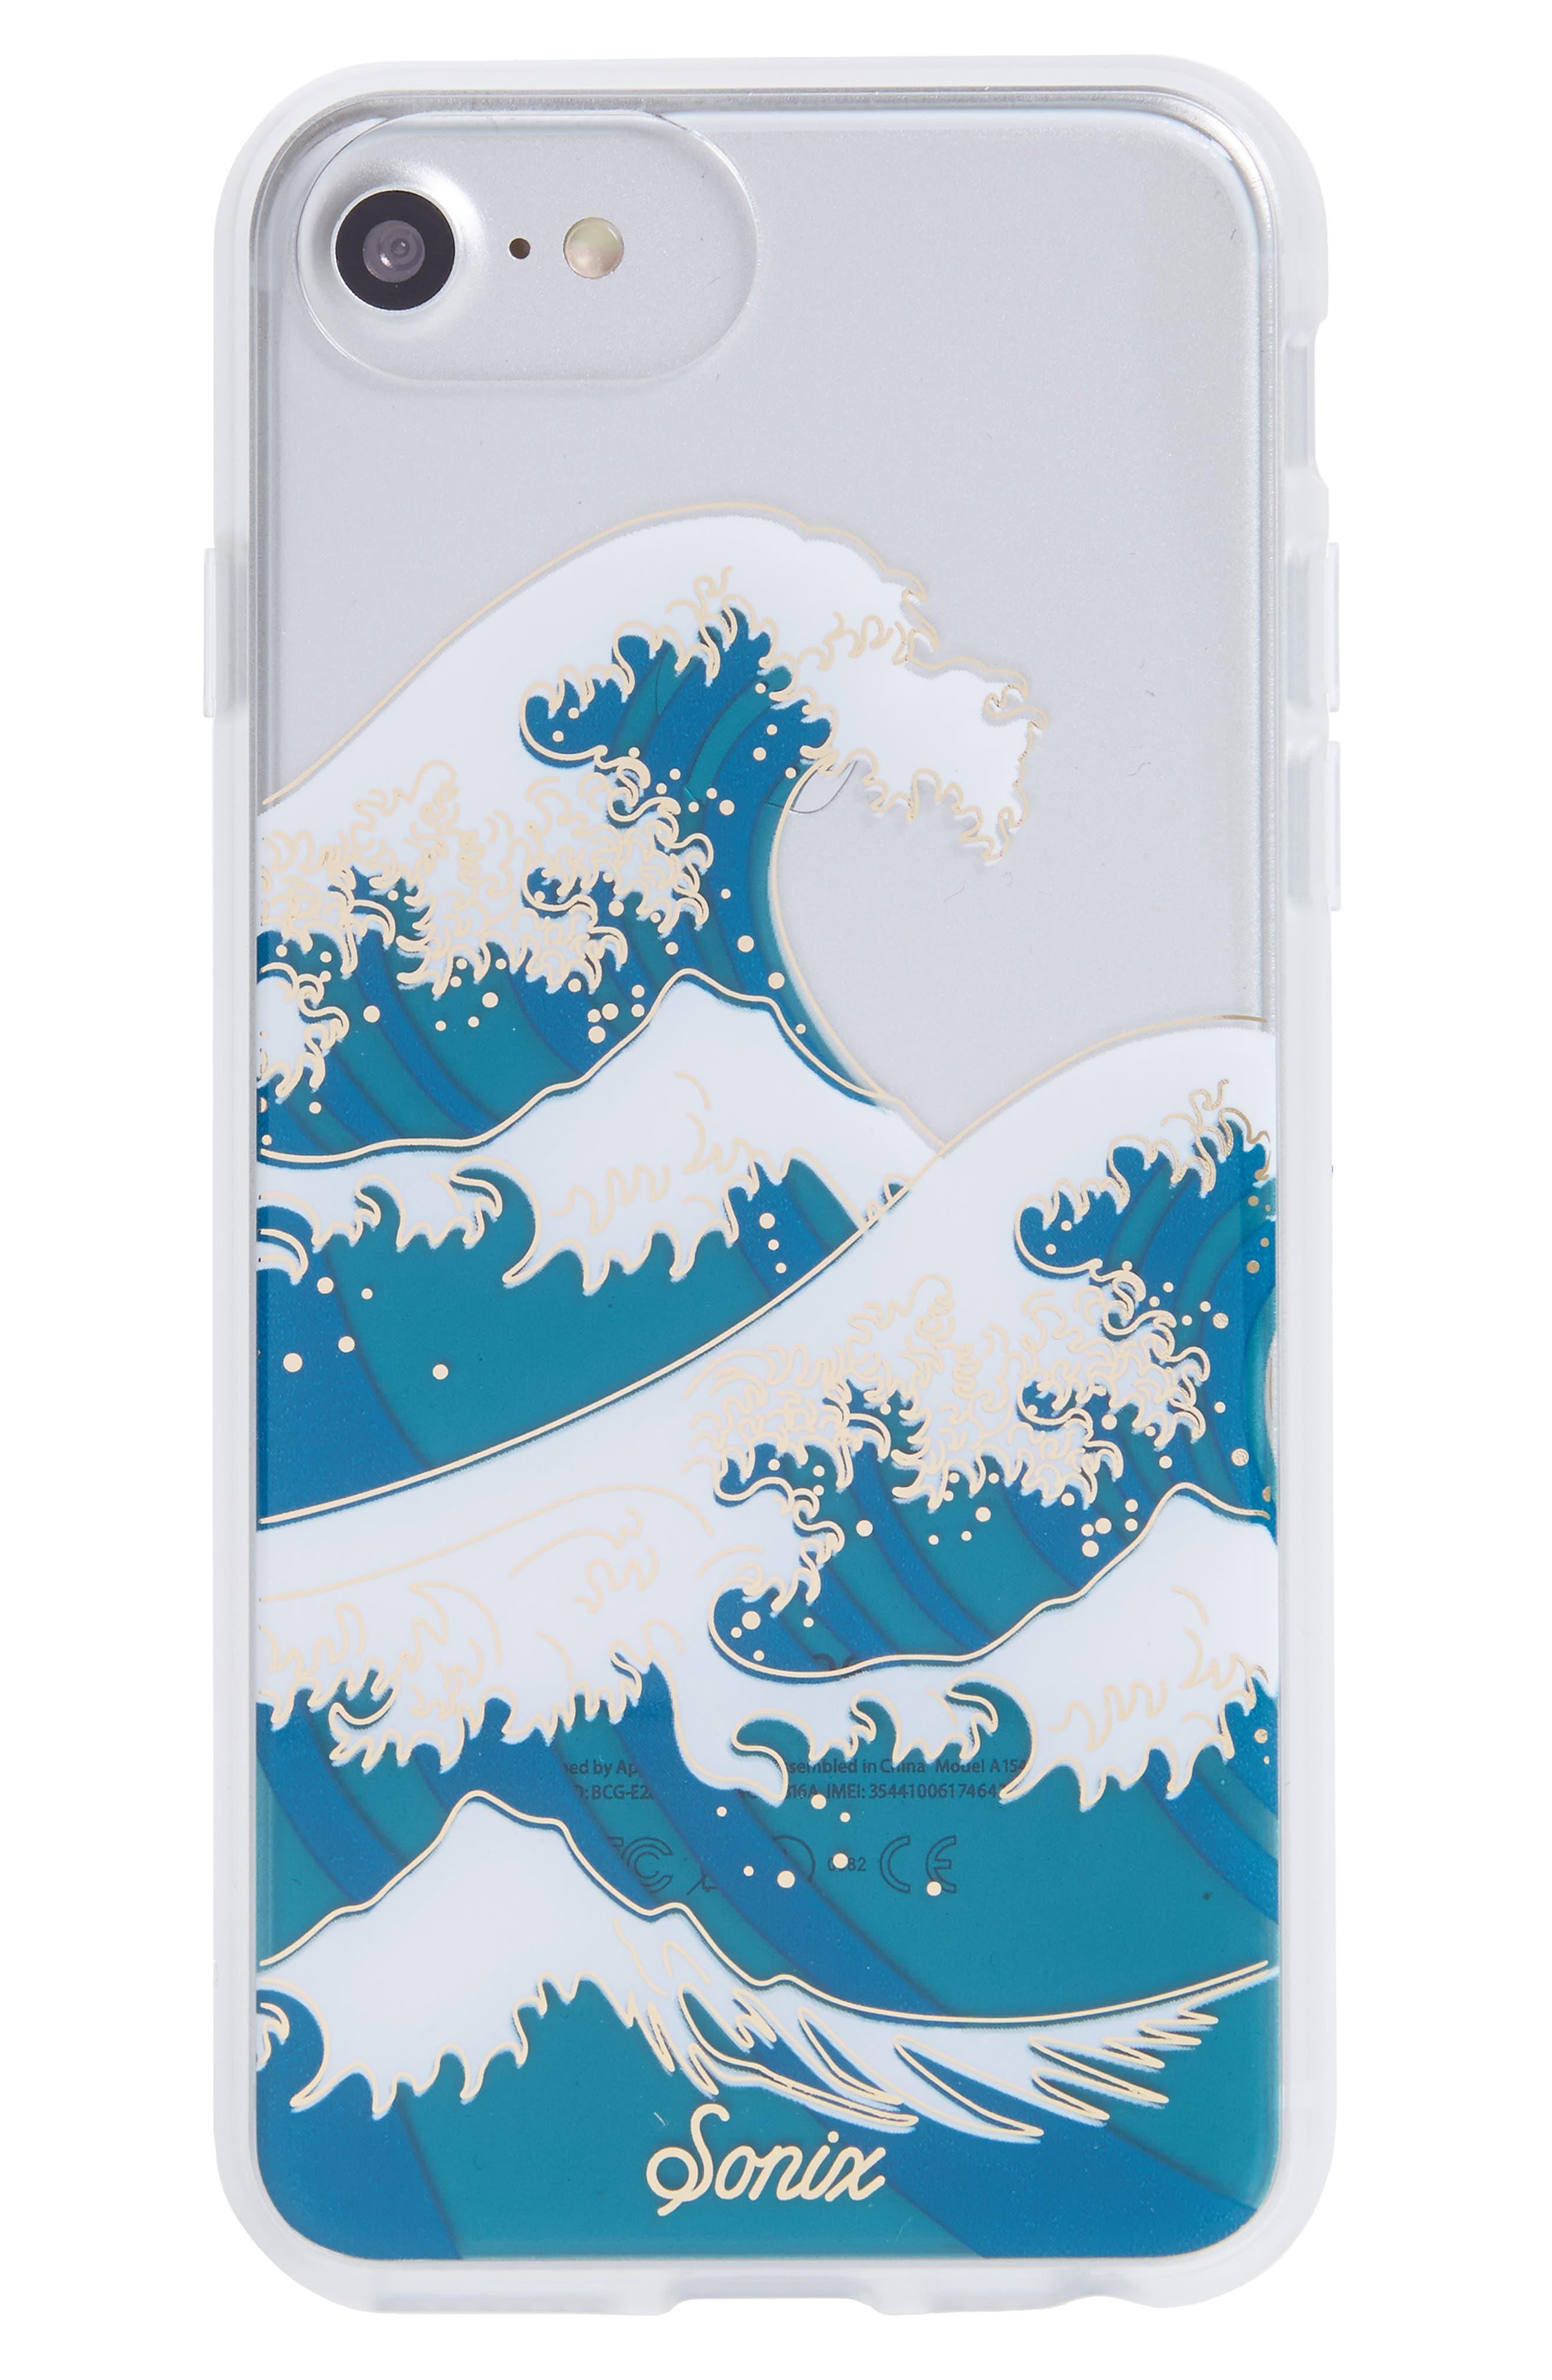 Sonix Tokyo Wave iPhone 6/6s/7/8 & 6/6s/7/8 Plus Case